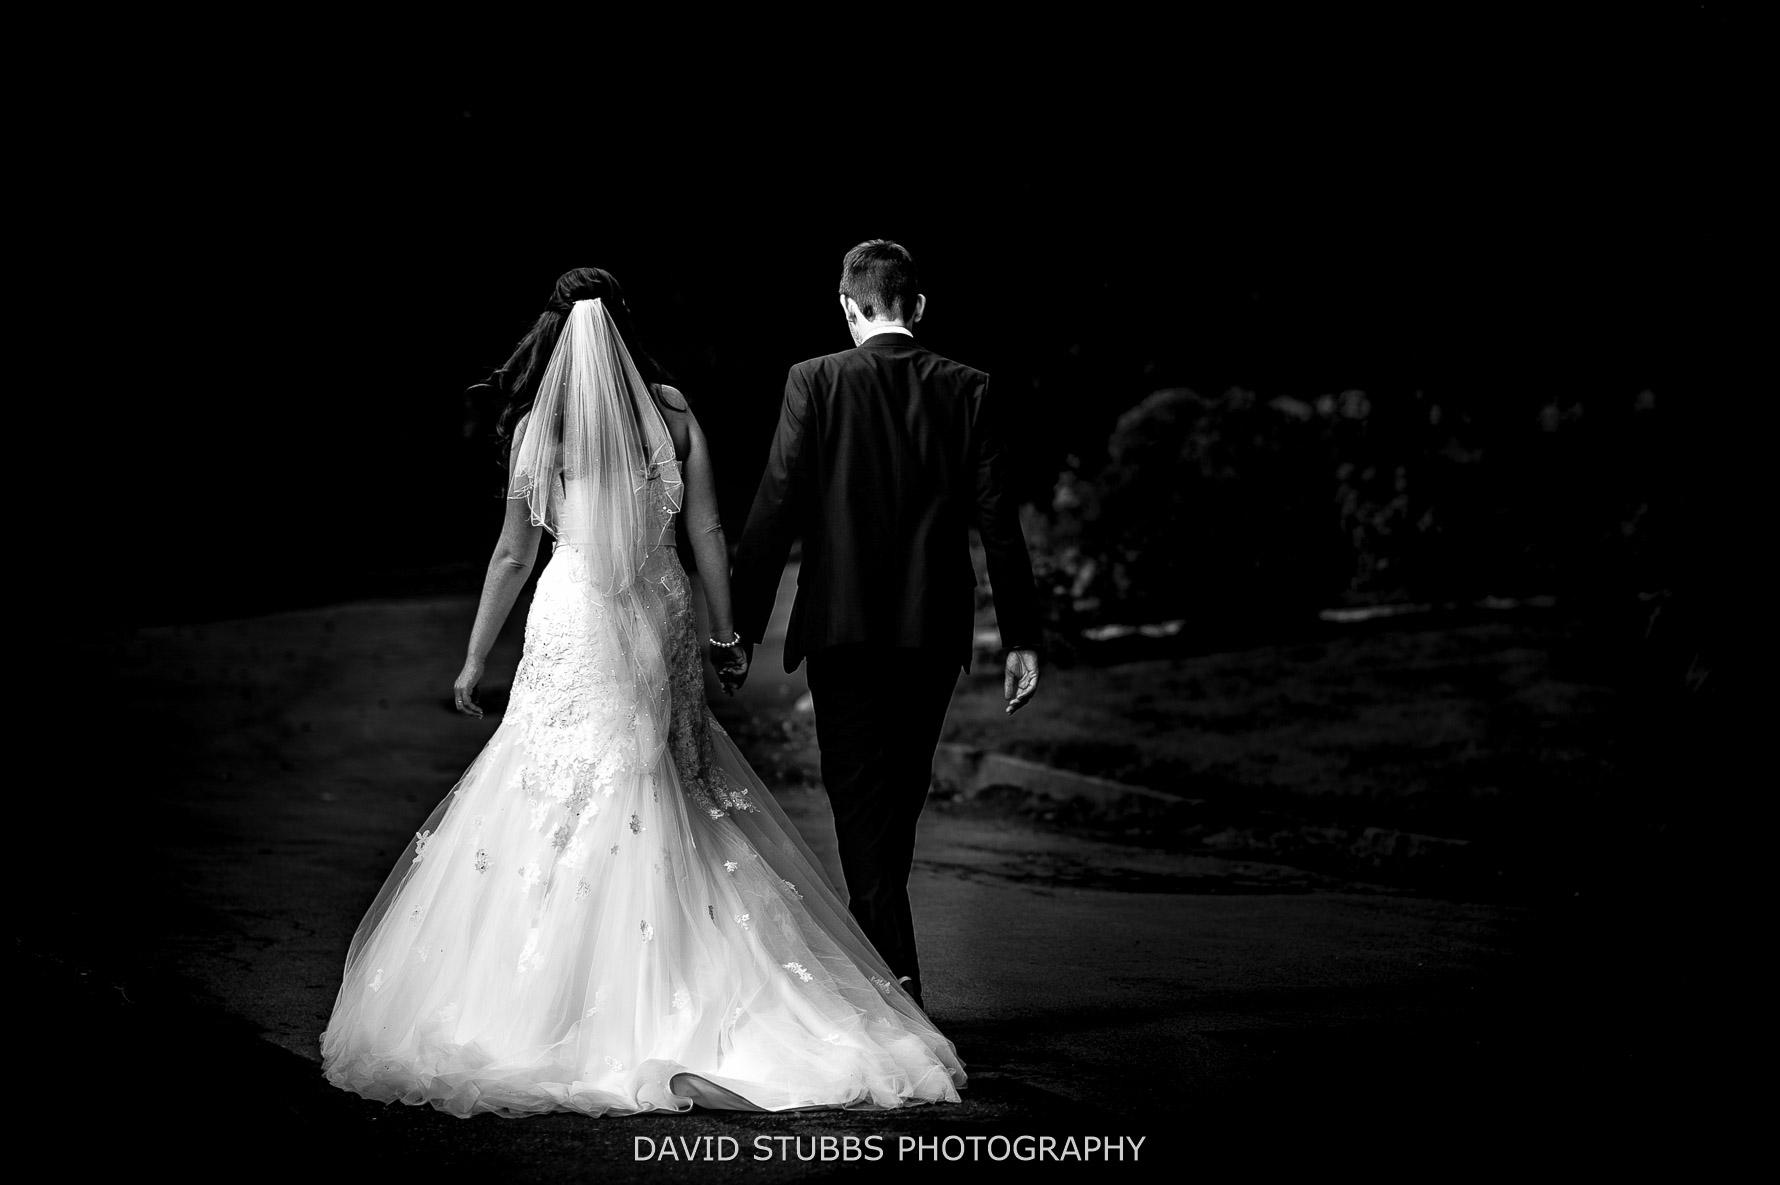 moody black and white photo